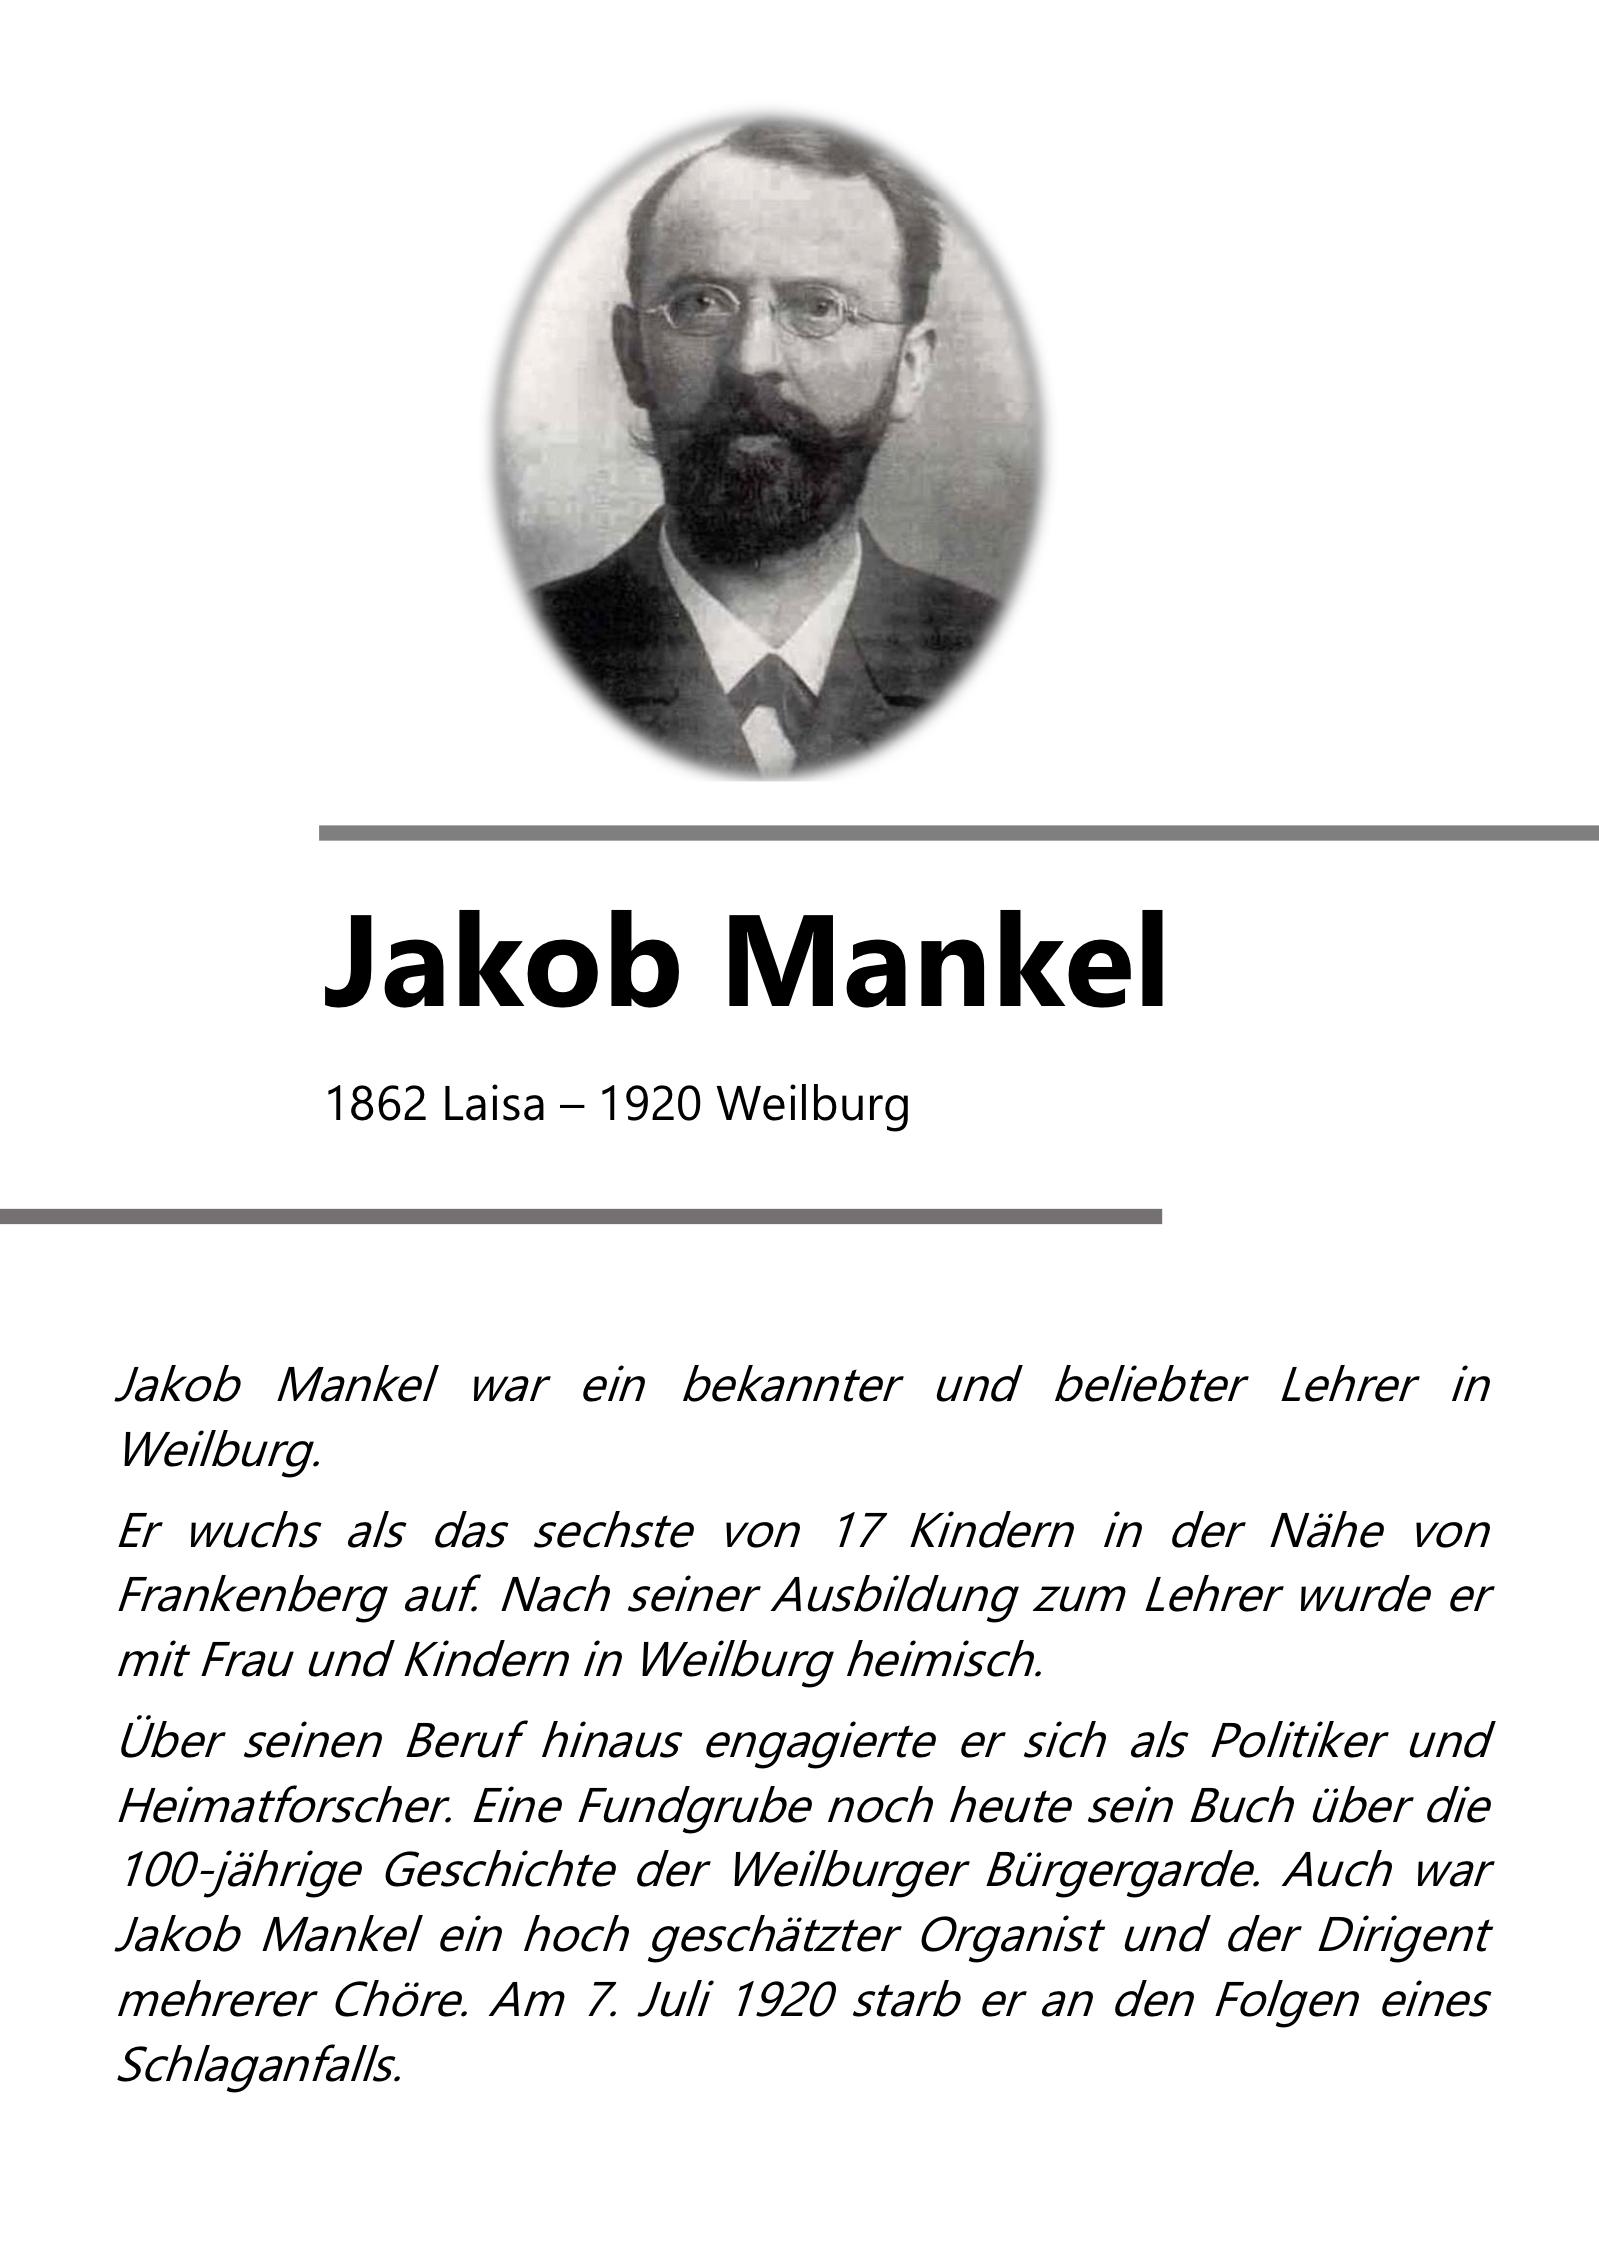 Jakob-Mankel